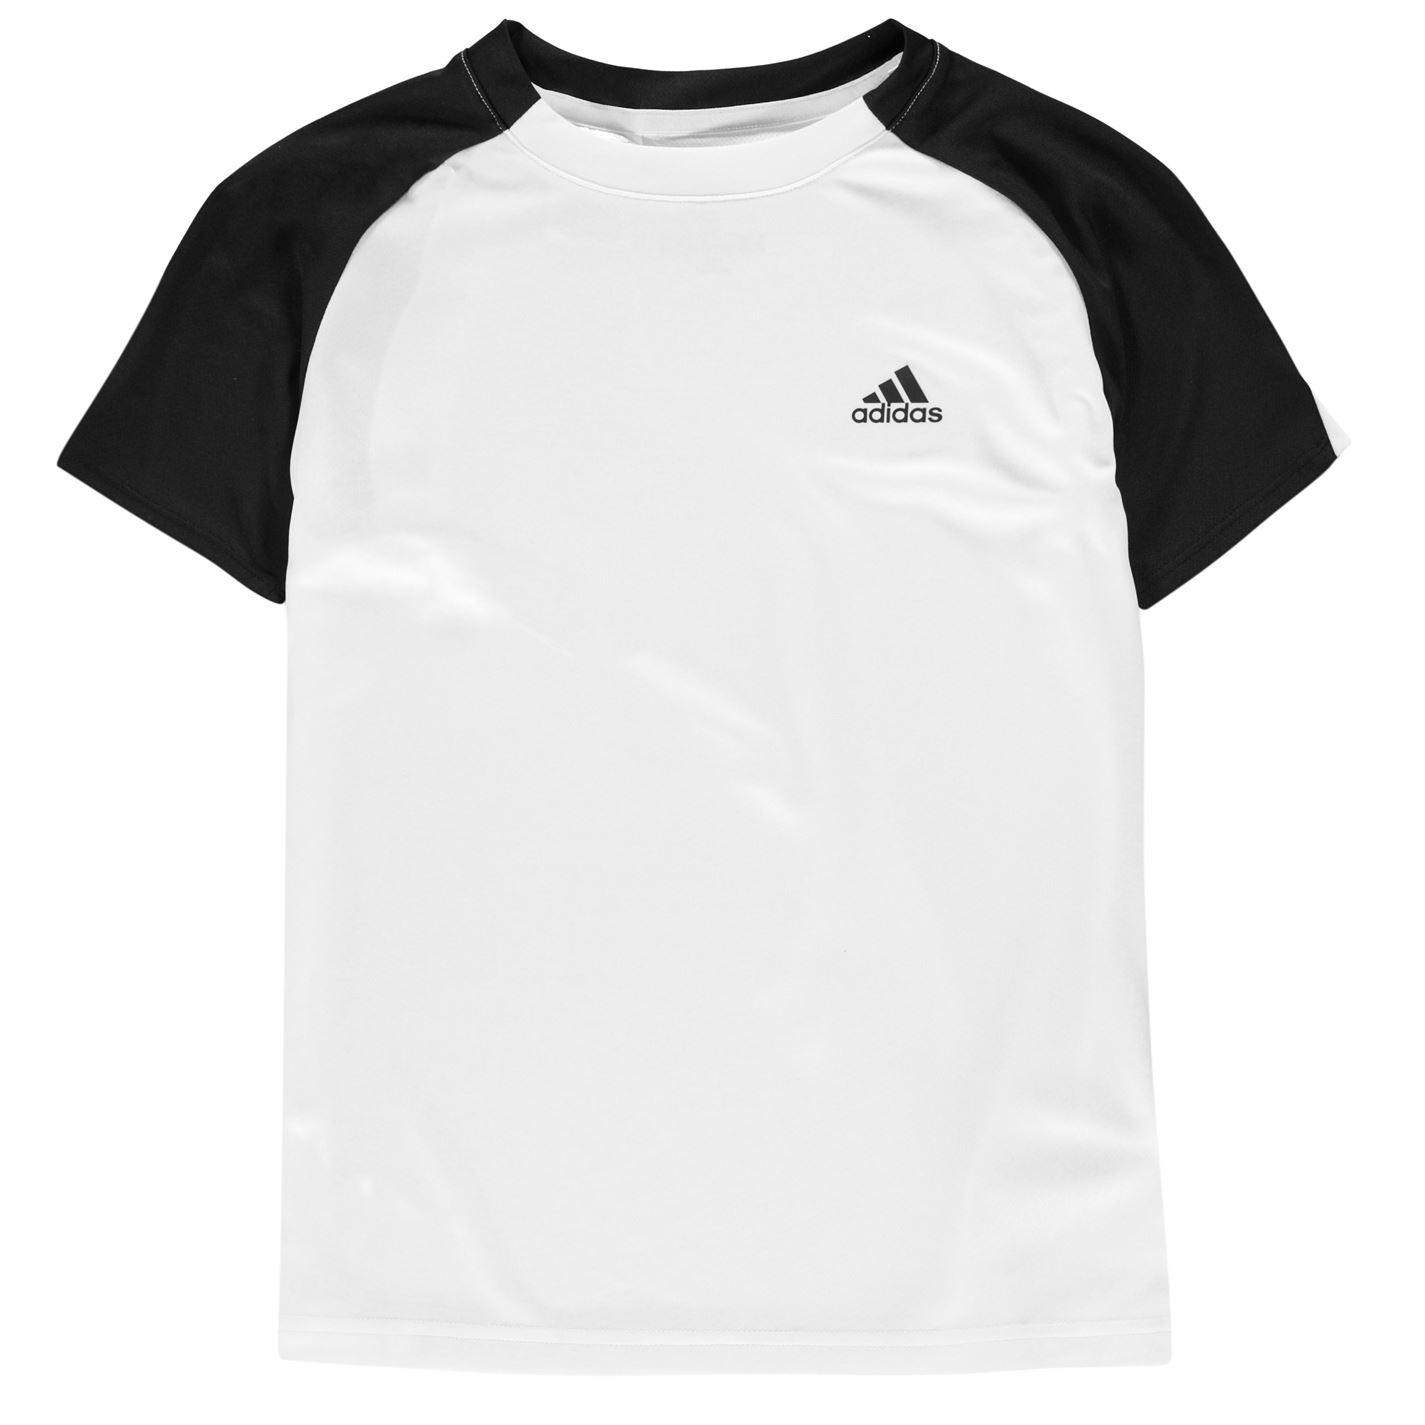 adidas NewBox Linea T Shirt Youngster Boys Crew Neck Tee Top Short Sleeve Cotton